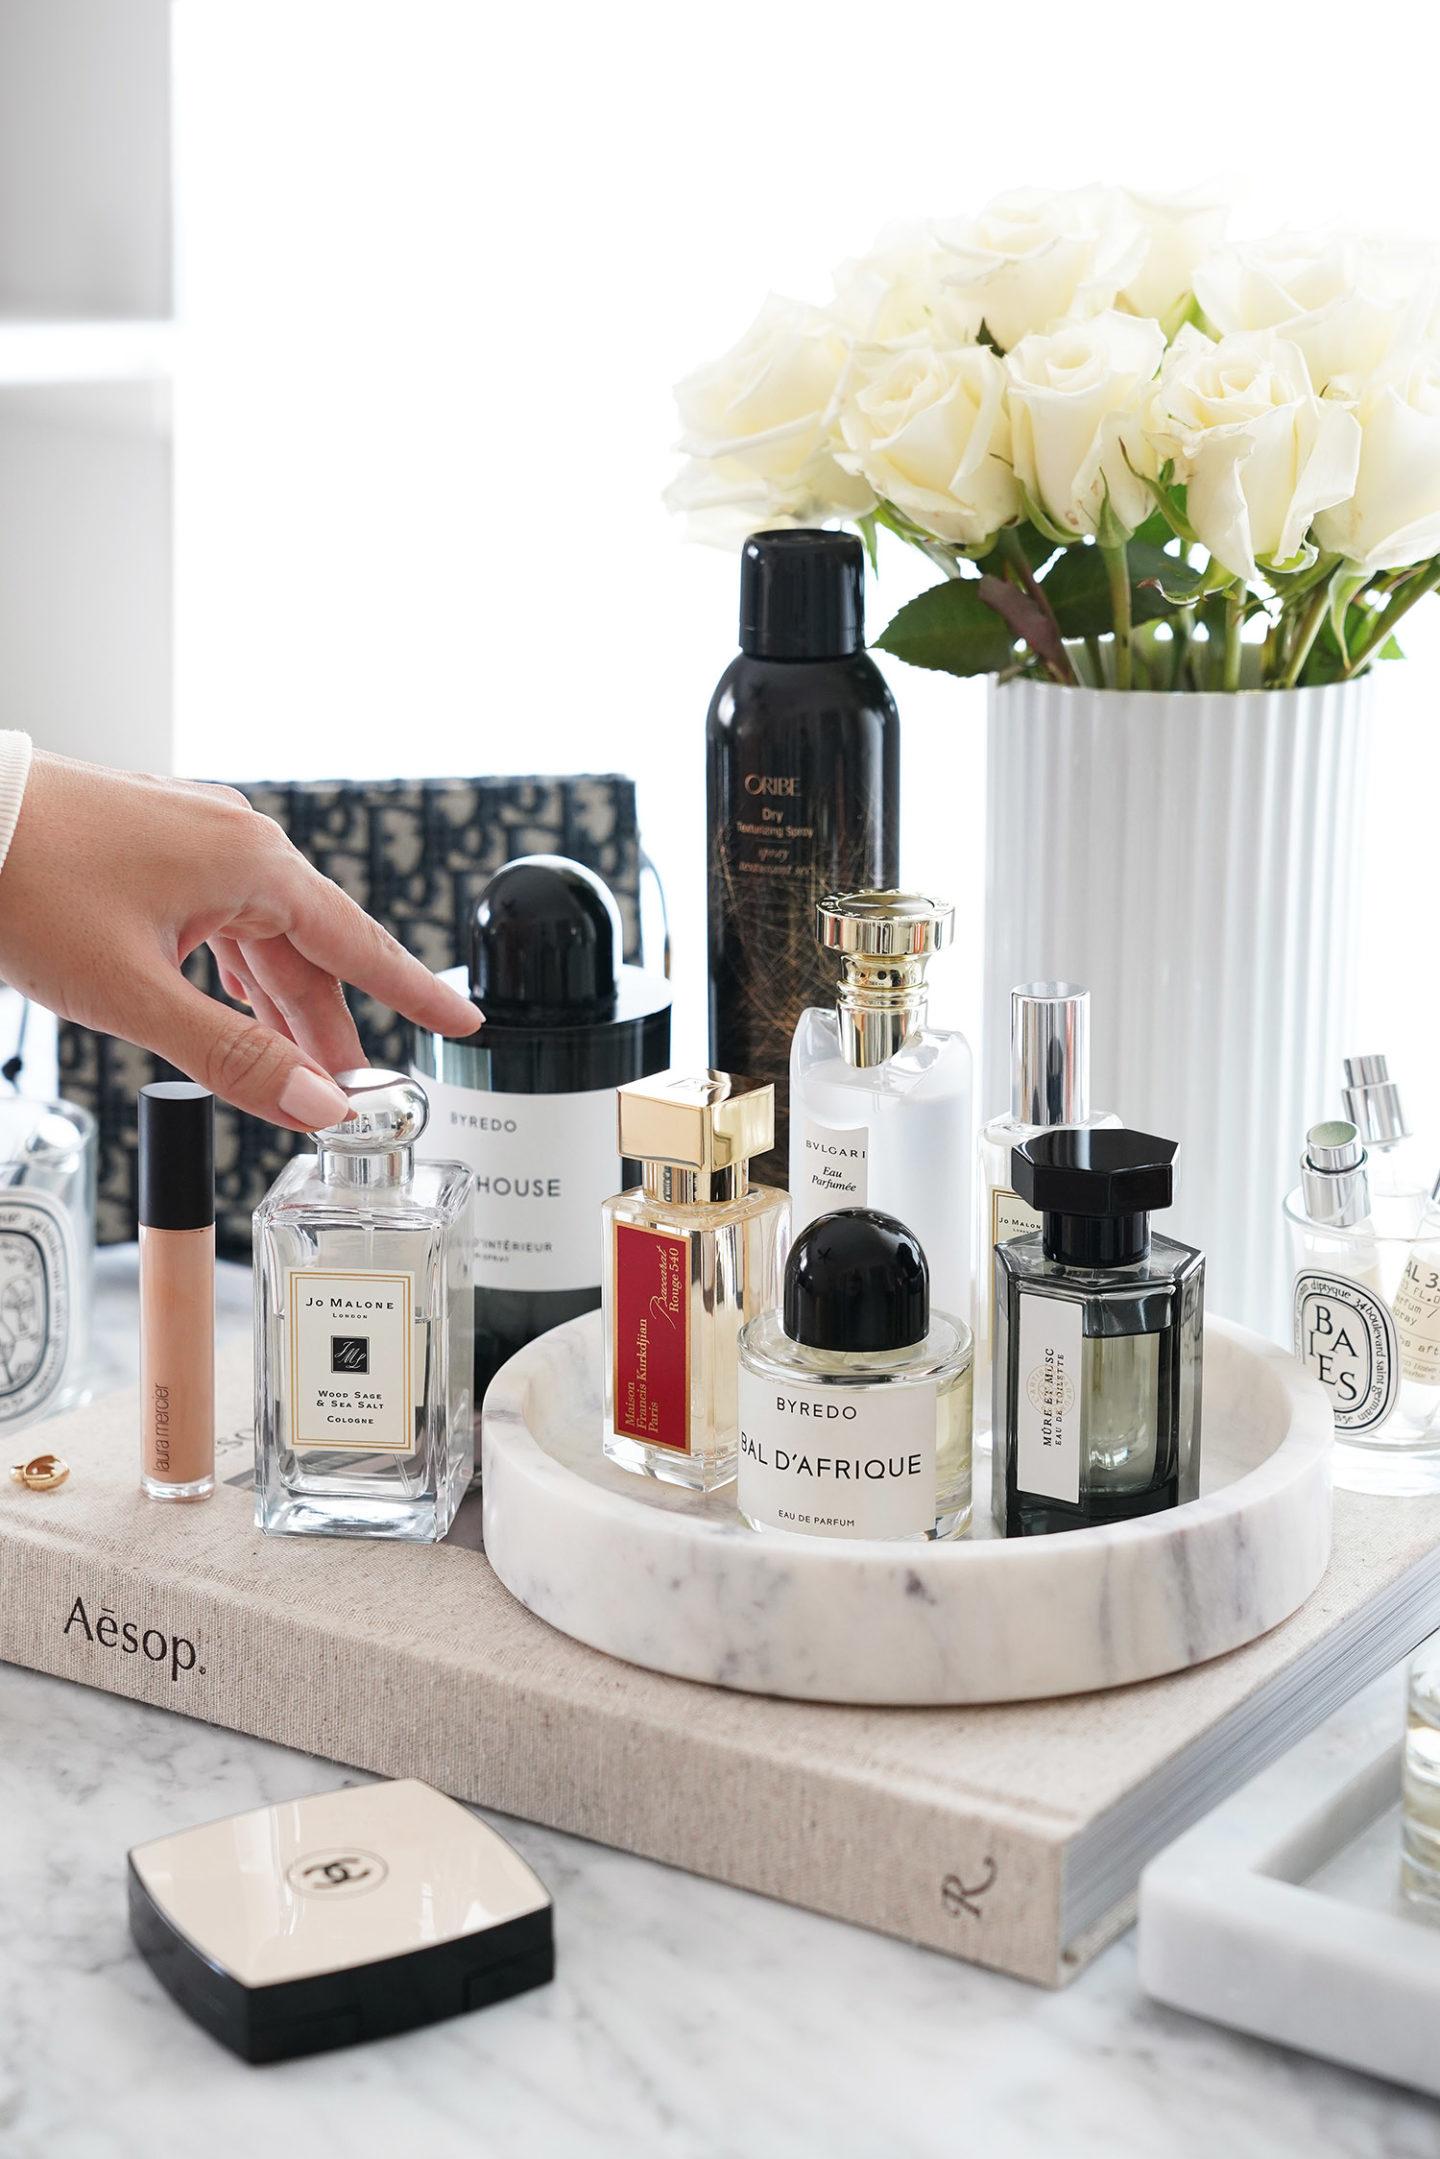 Parfums préférés des Parfums Jo Malone, Bulgari, Byredo, L'Artisan et Maison Francis Kurkdjian